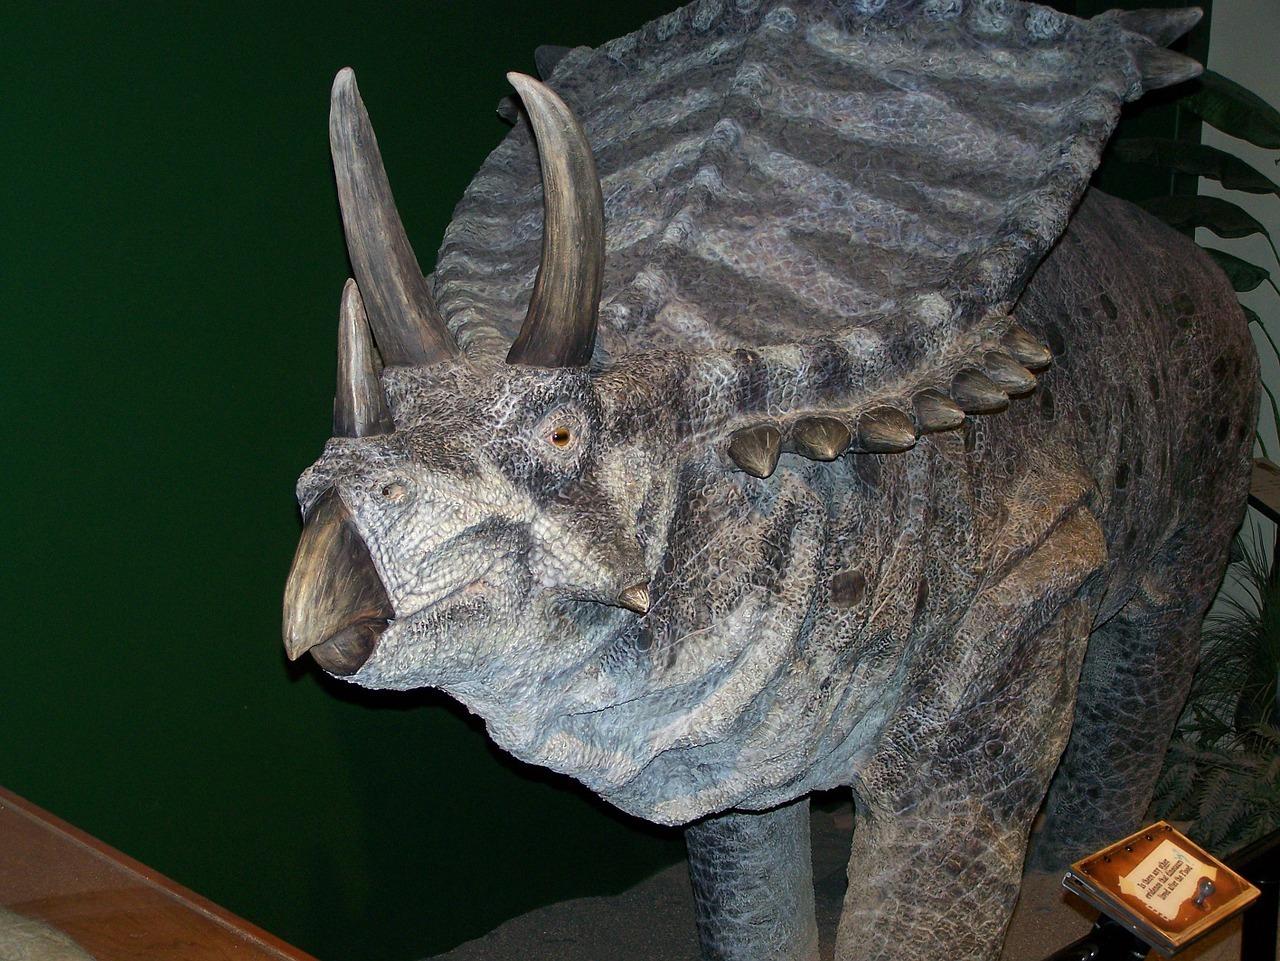 dinosaur-950449_1280.jpg